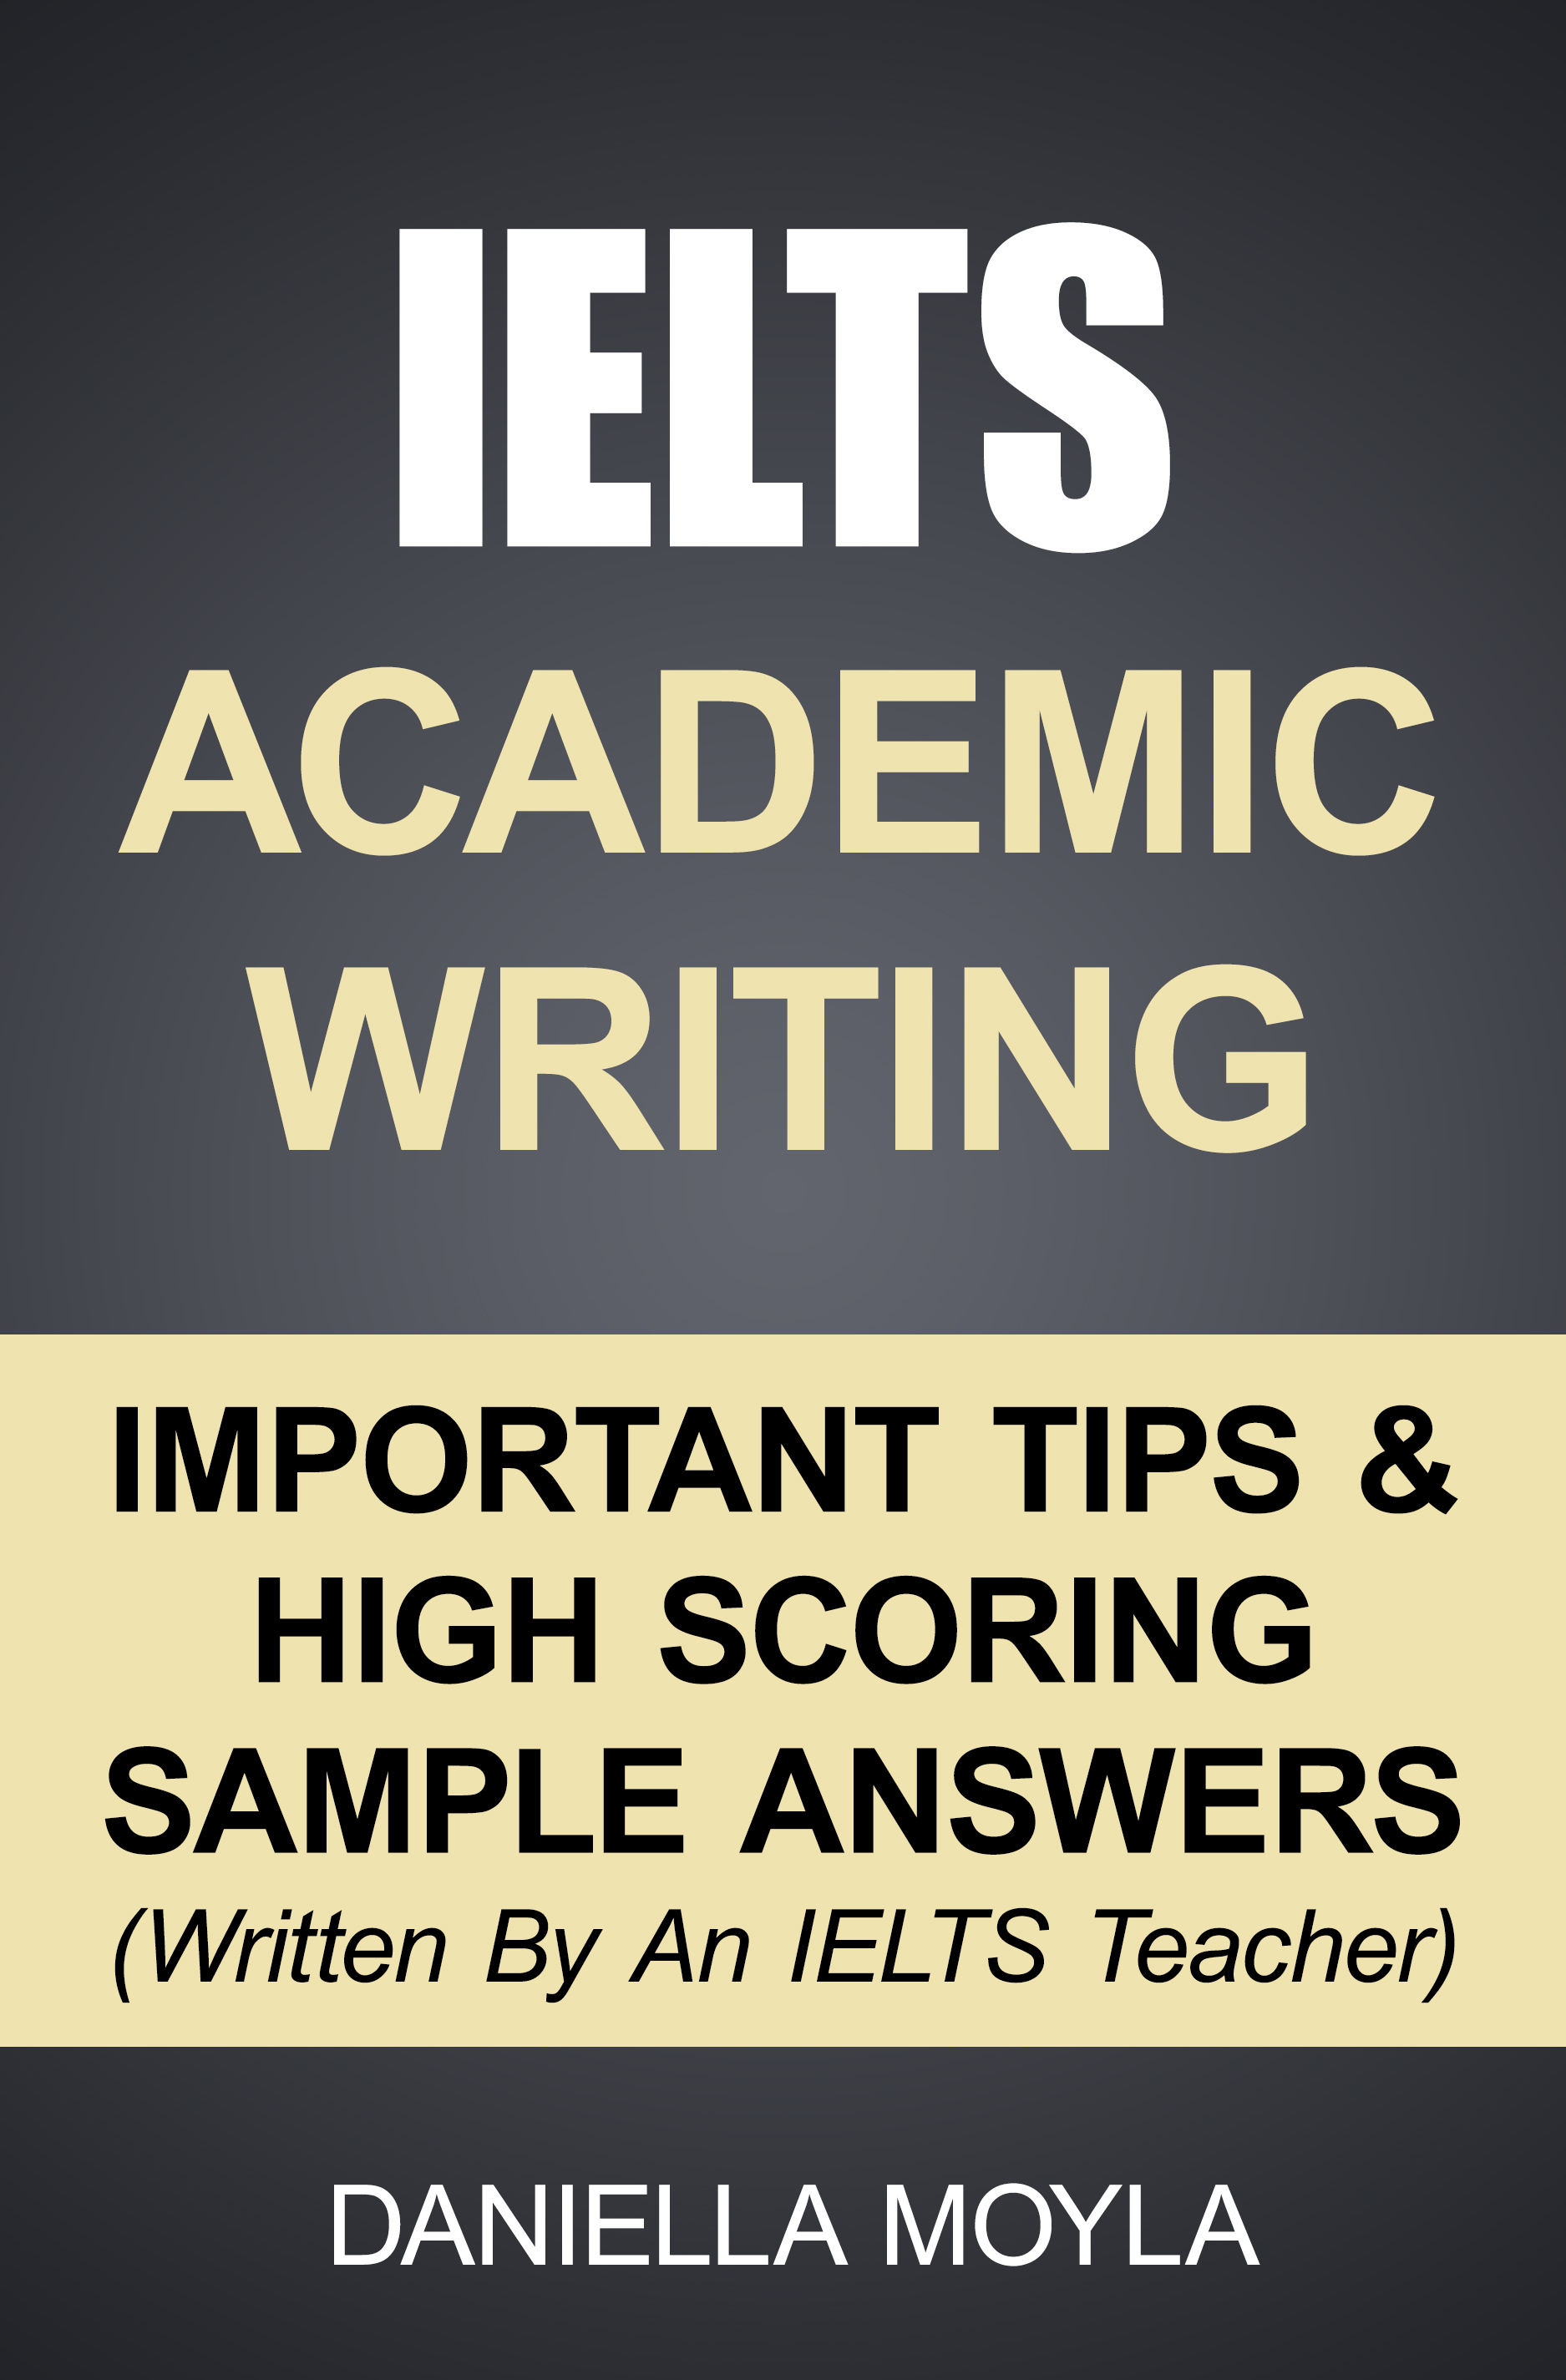 Academic Writing For Ielts Pdf